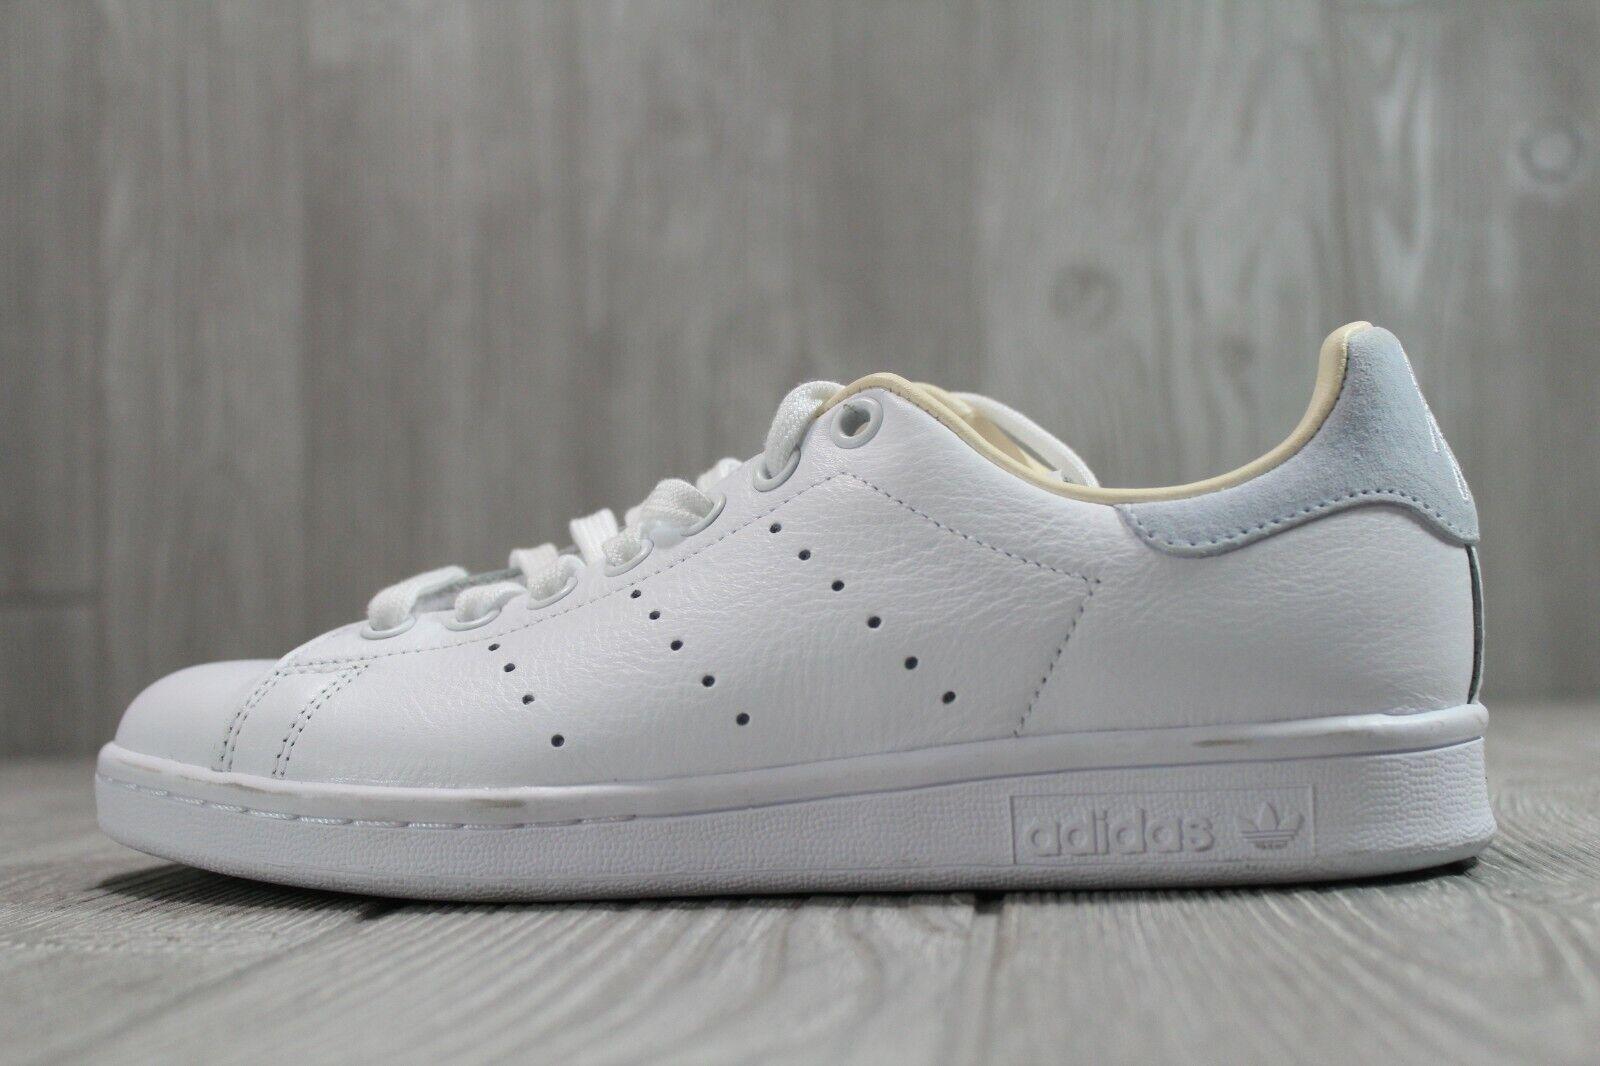 stan smith adidas 6.5